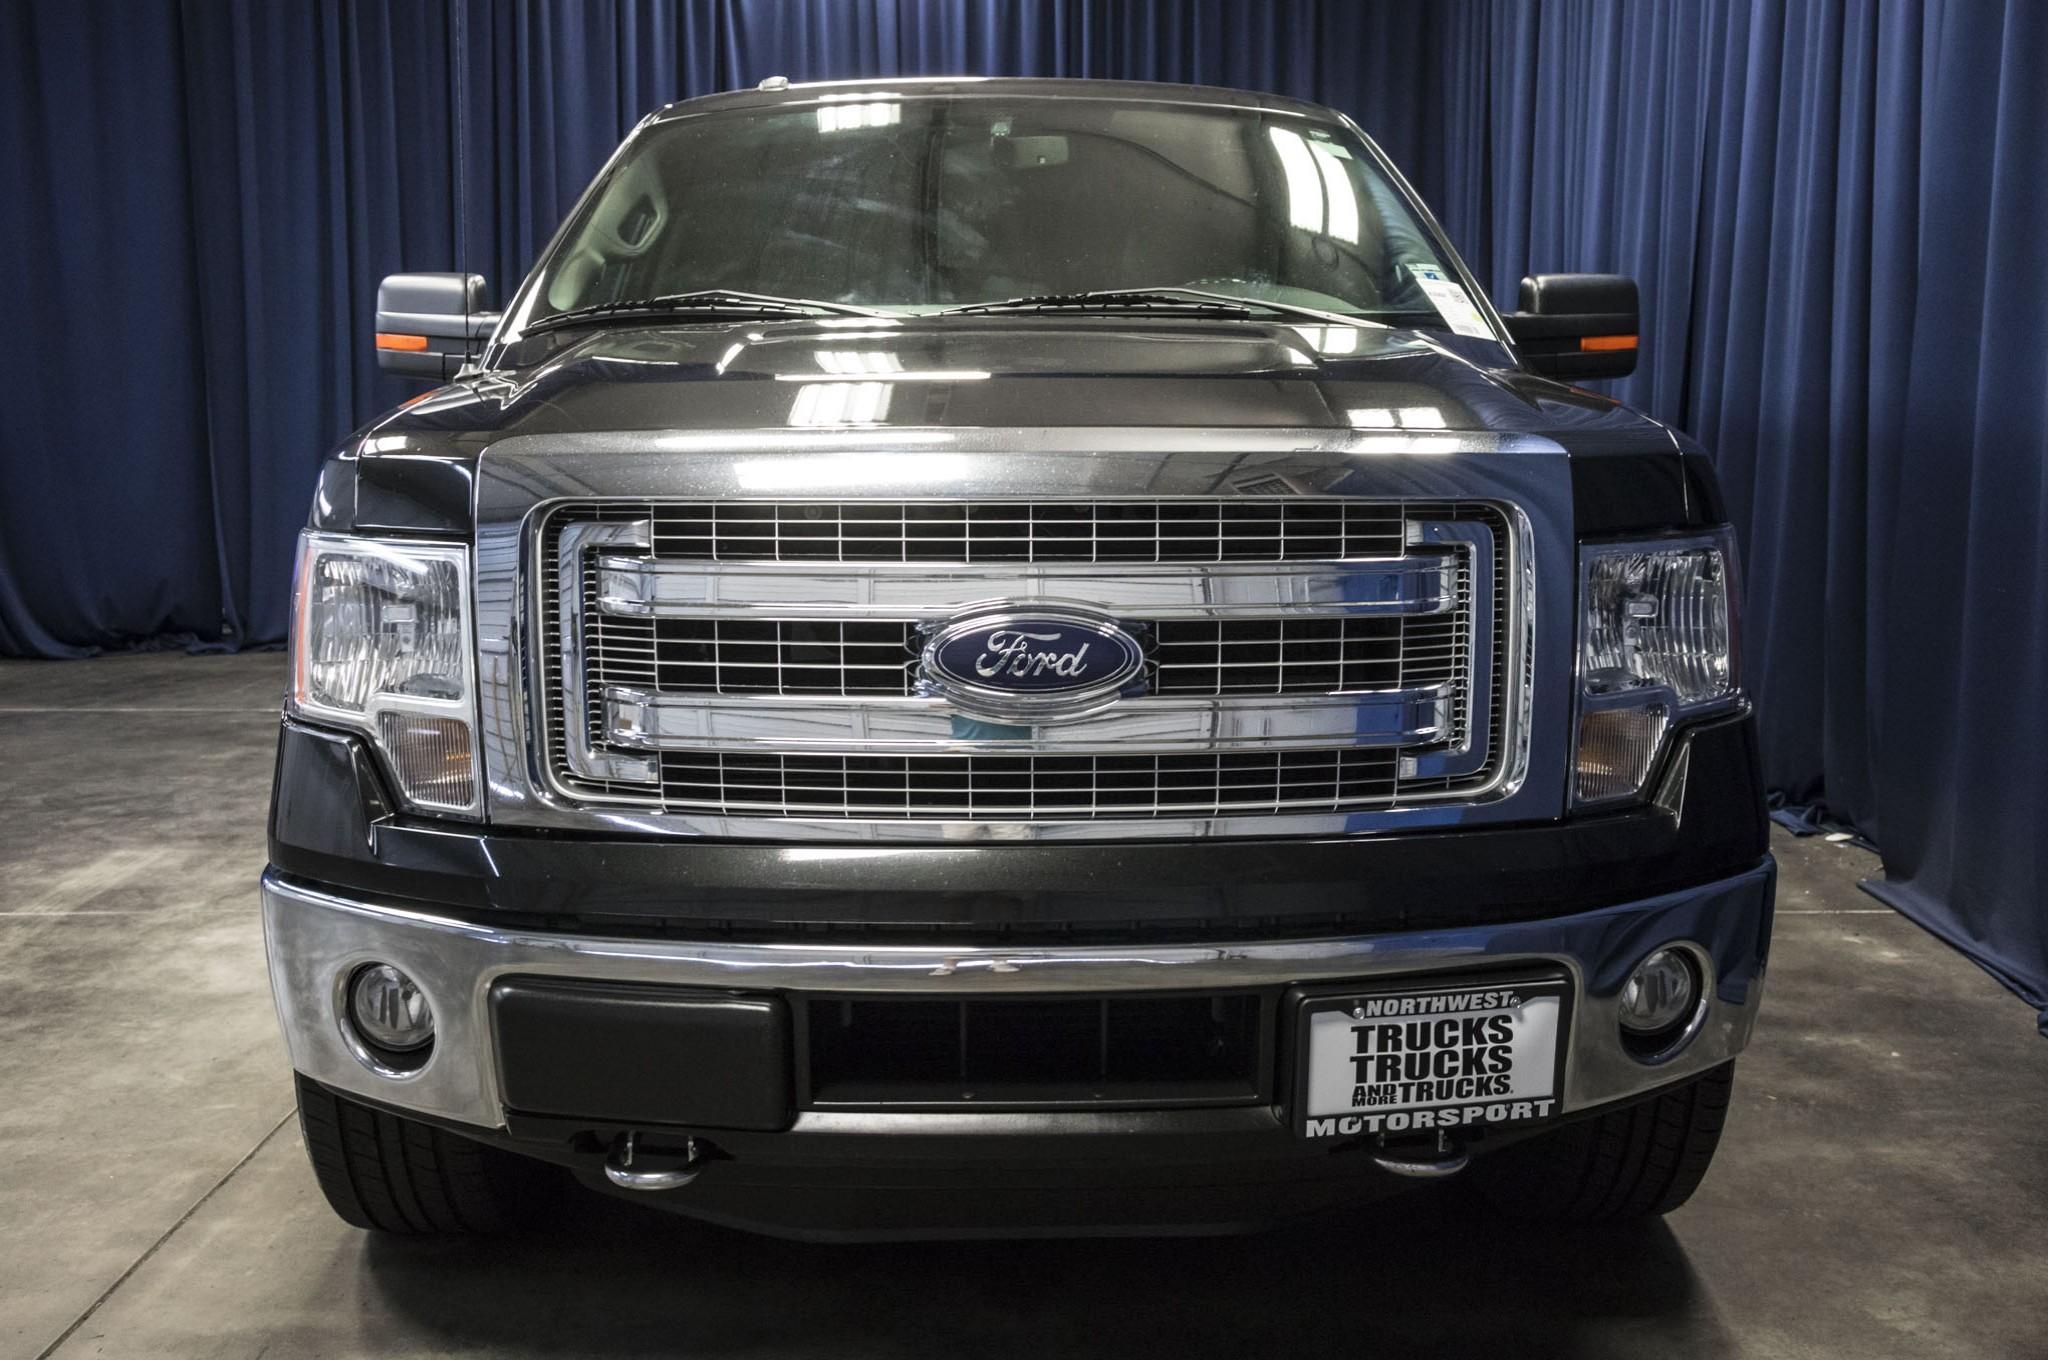 used 2014 ford f 150 xtr ecoboost 4x4 truck for sale 43992. Black Bedroom Furniture Sets. Home Design Ideas